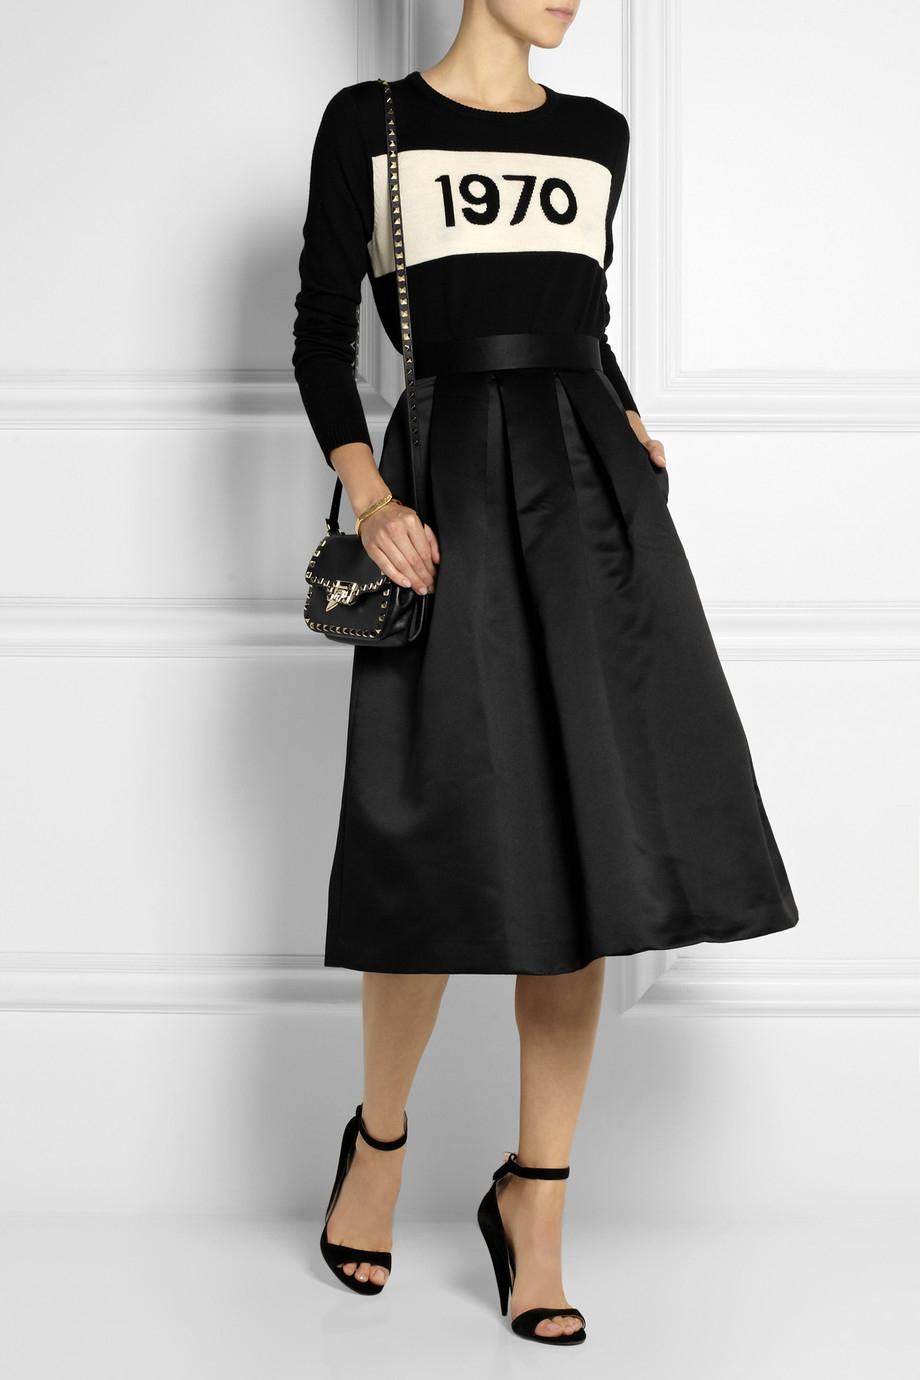 Lulu & co Pleated Brushed-Satin Midi Skirt in Black | Lyst